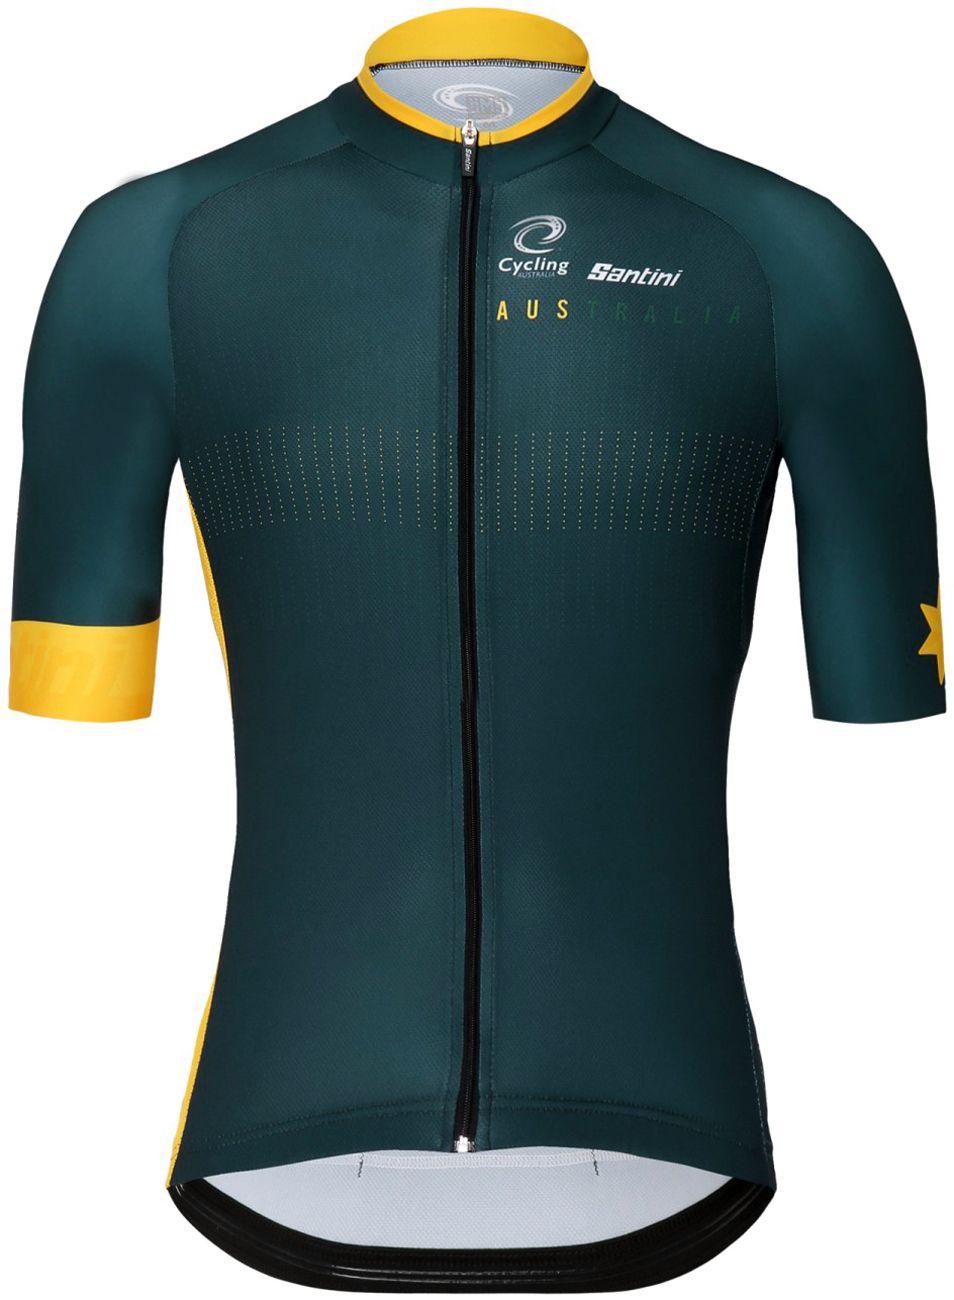 ... Santini national cycling team. Previous fee16745a